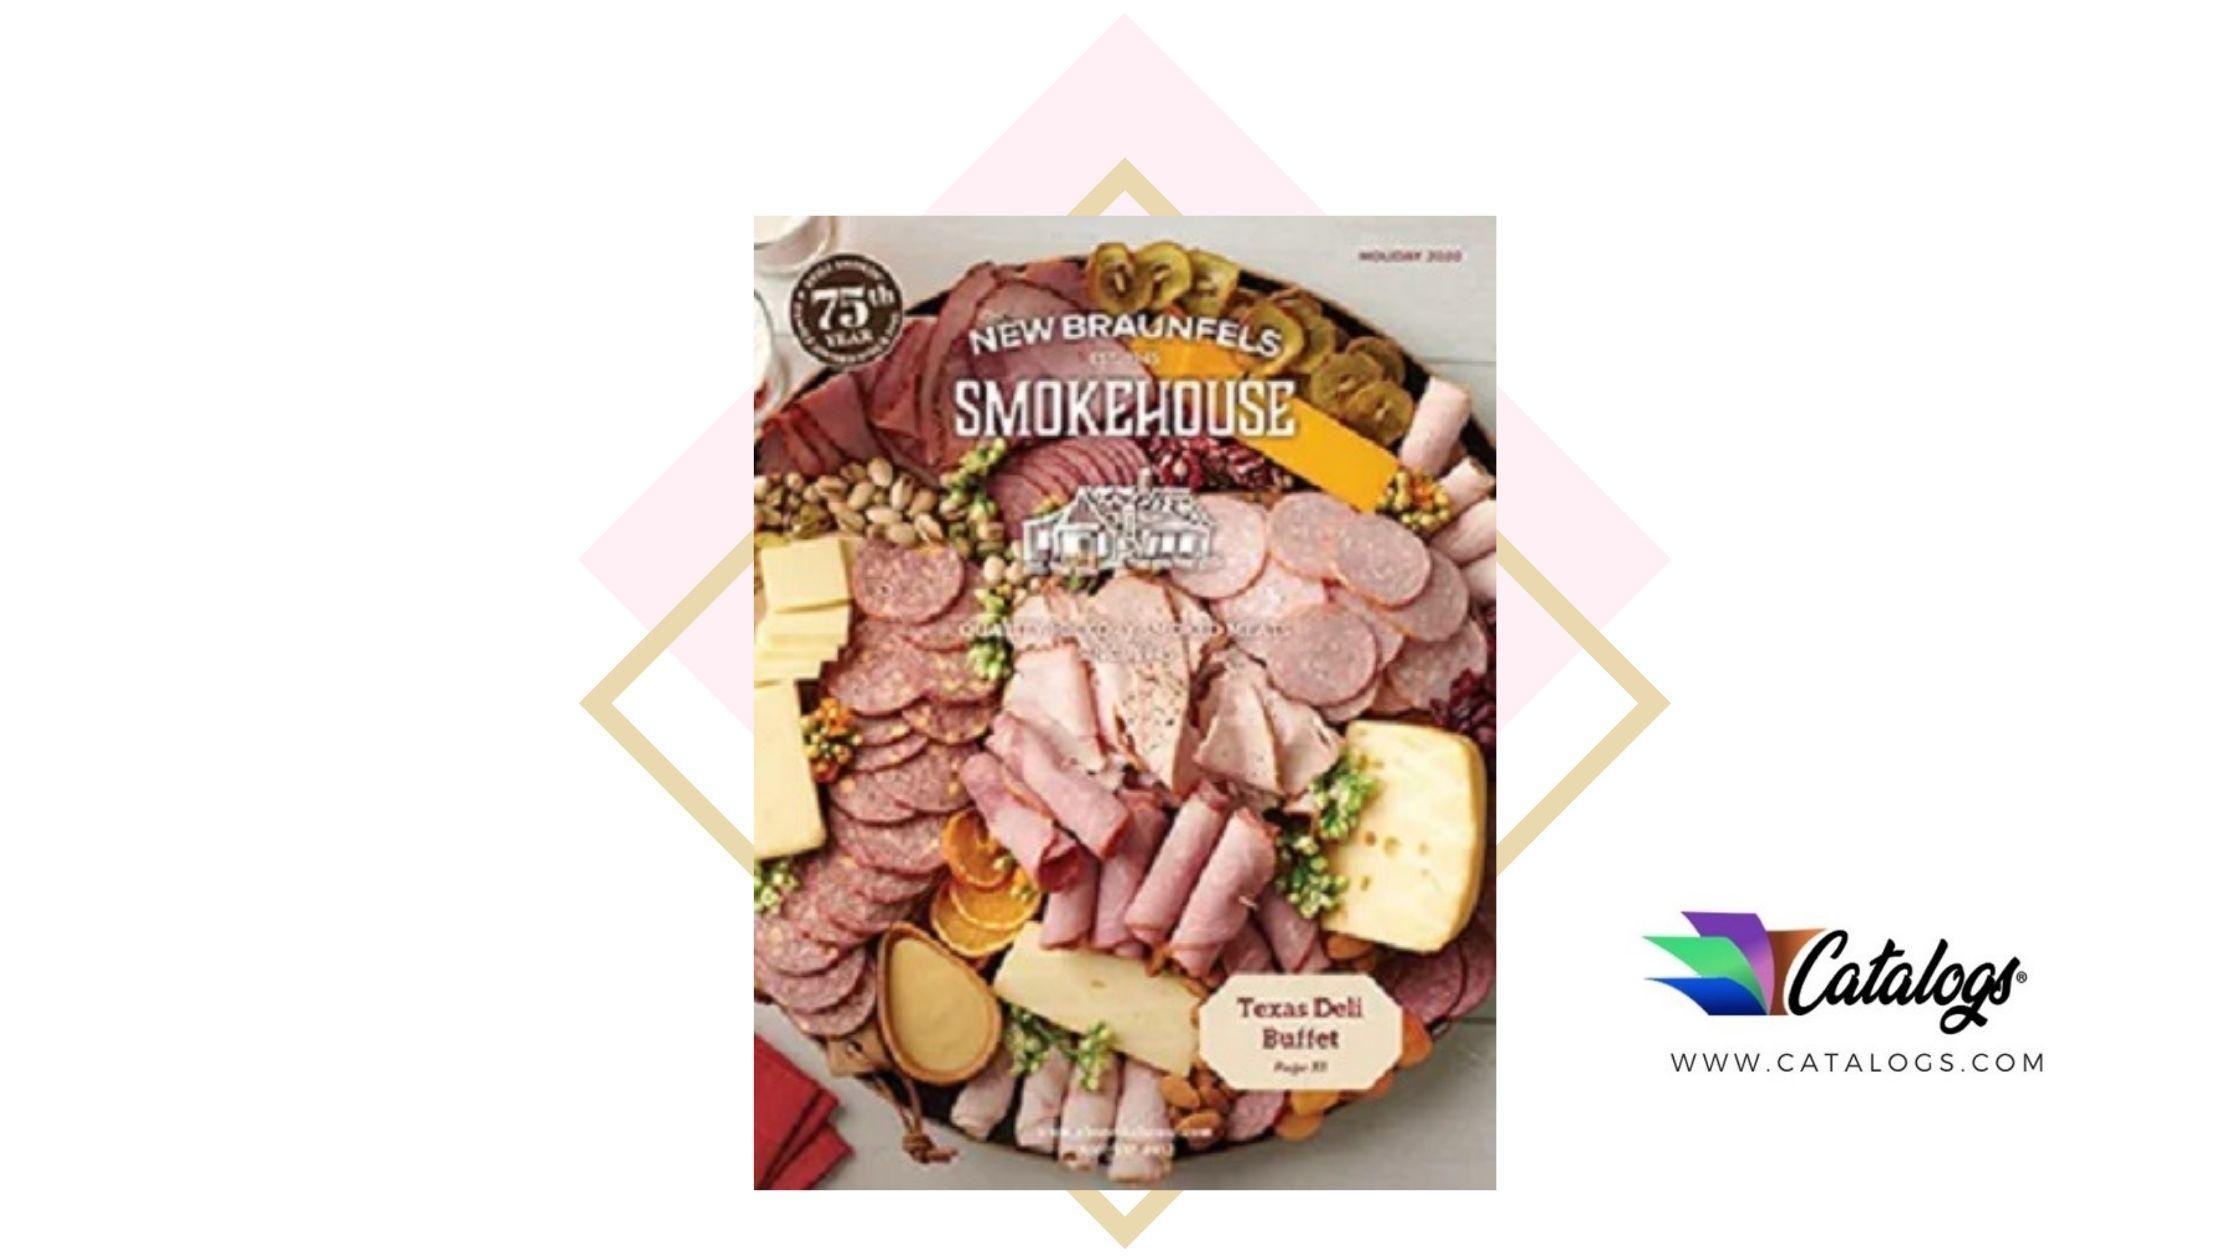 How Do I Order a Free New Braunfels Smokehouse Food & Gourmet Catalog?